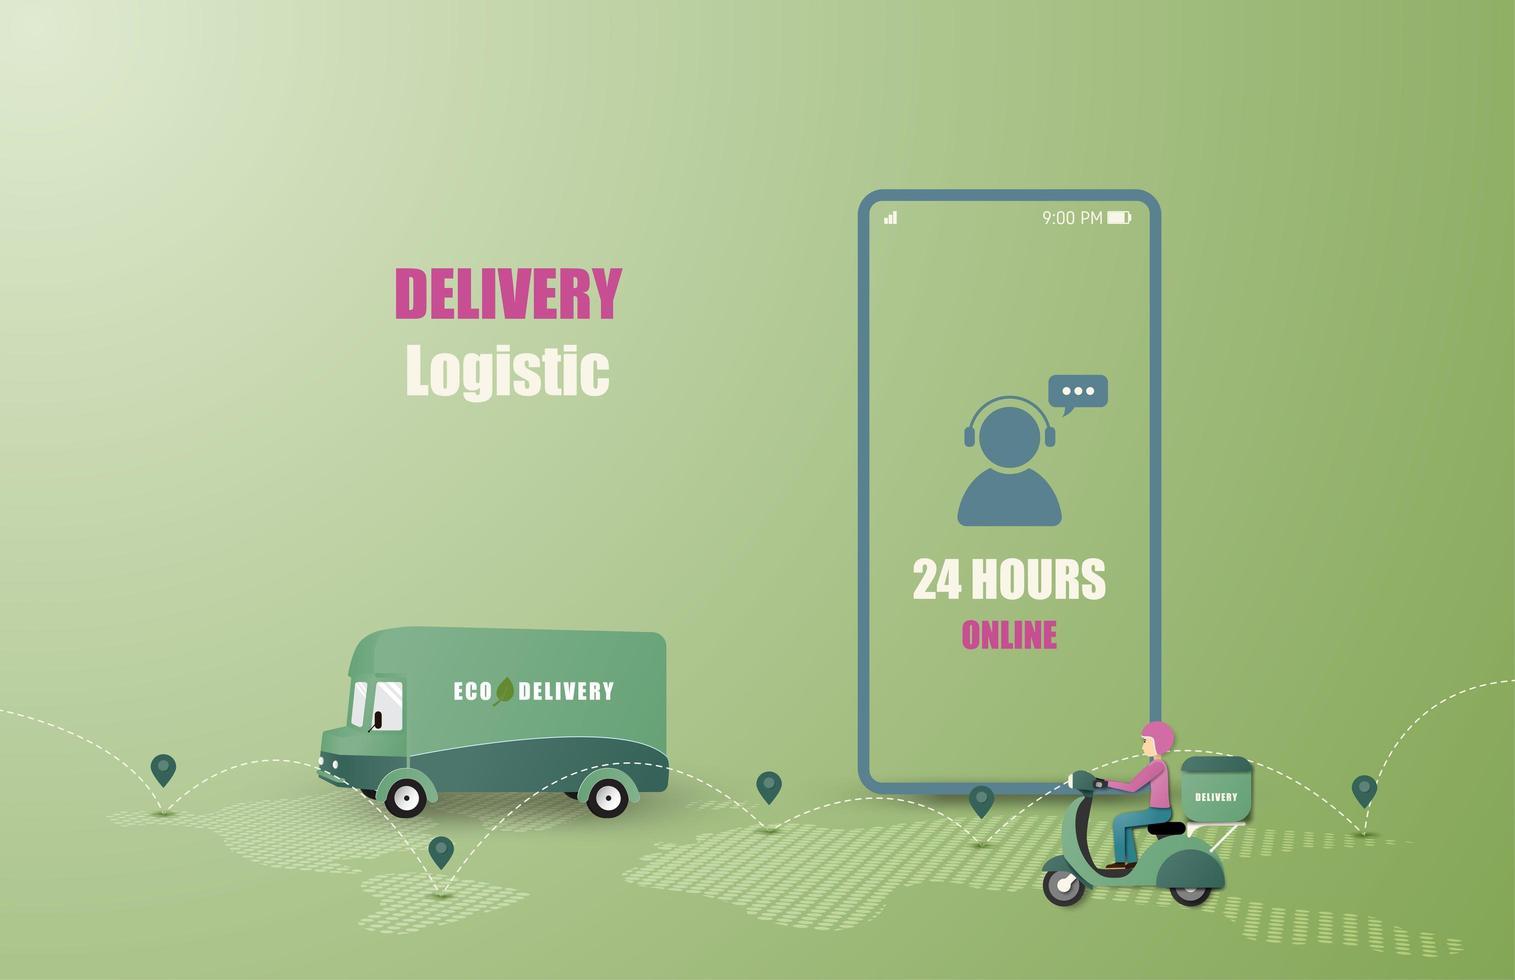 serviço de entrega on-line van de entrega e condução de moto vetor